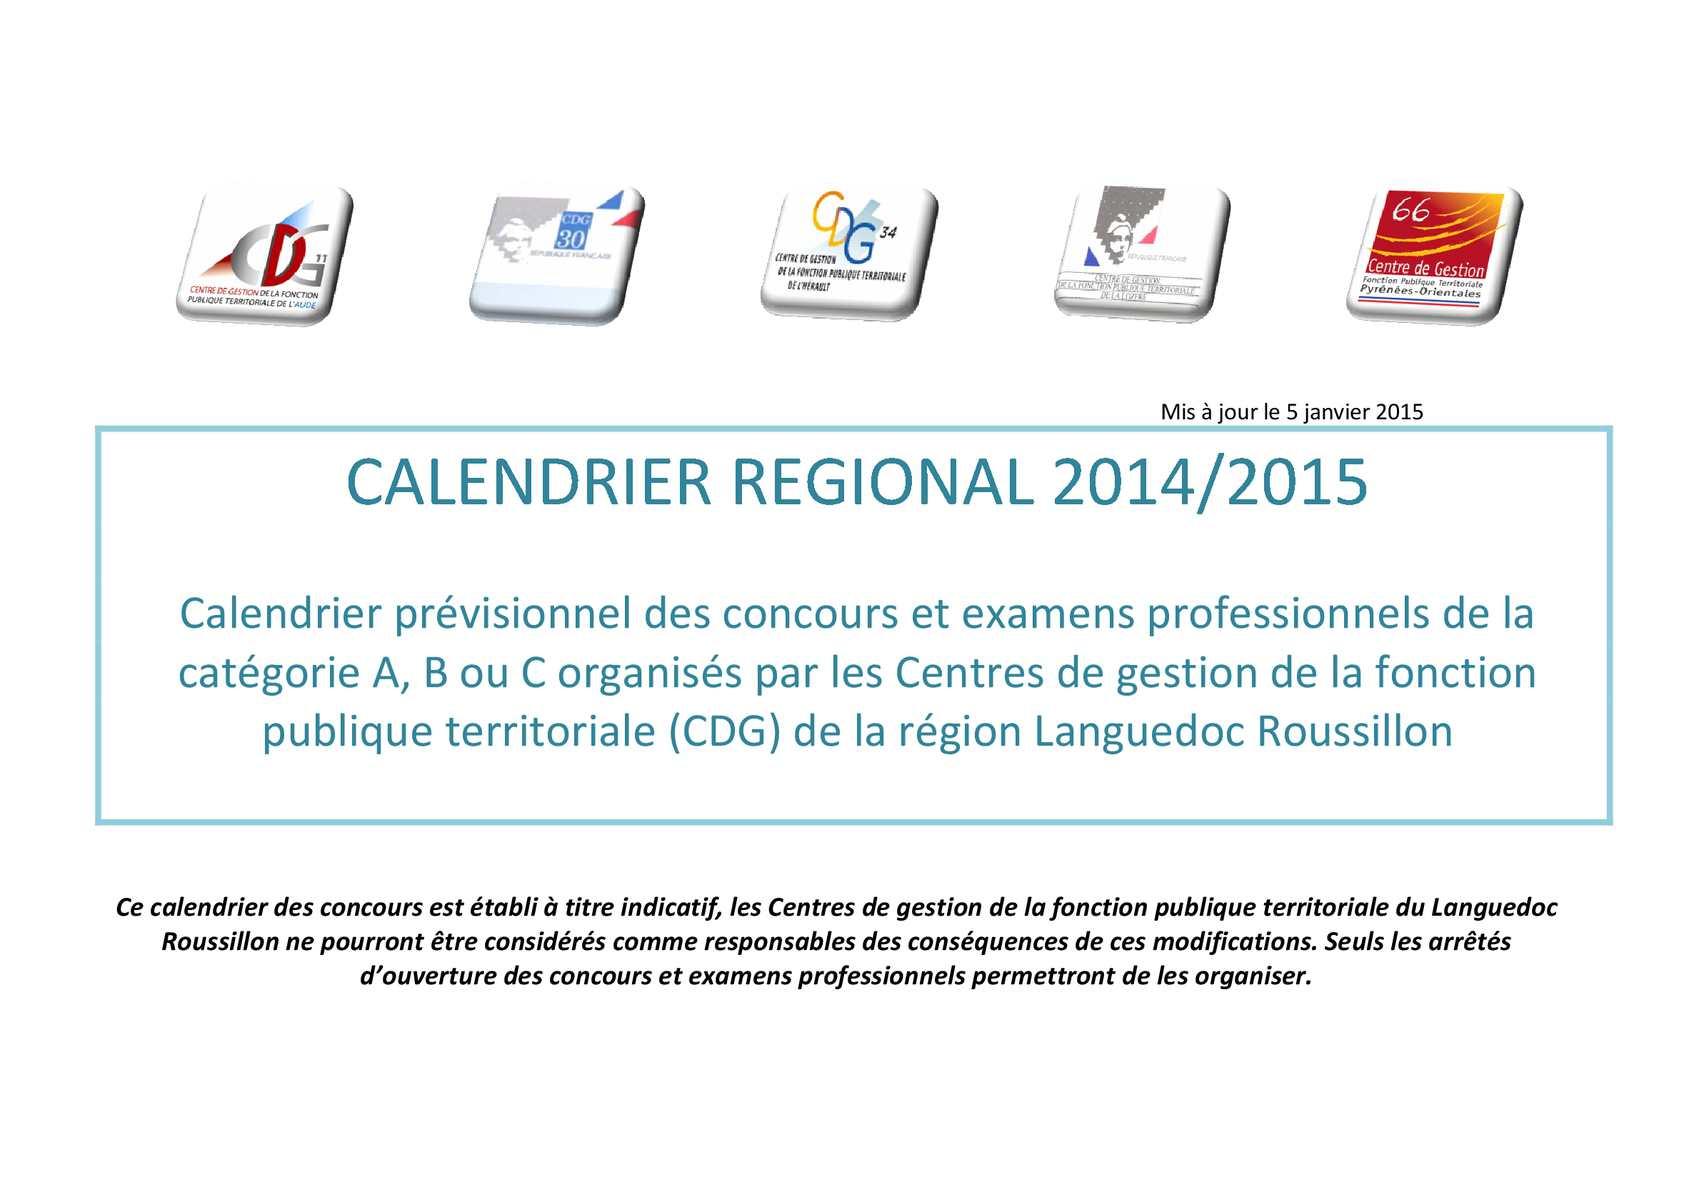 Concours Fonction Publique Categorie C Calendrier.Calameo Calendrier Regional 2014 2015 Maj 05 01 15v2